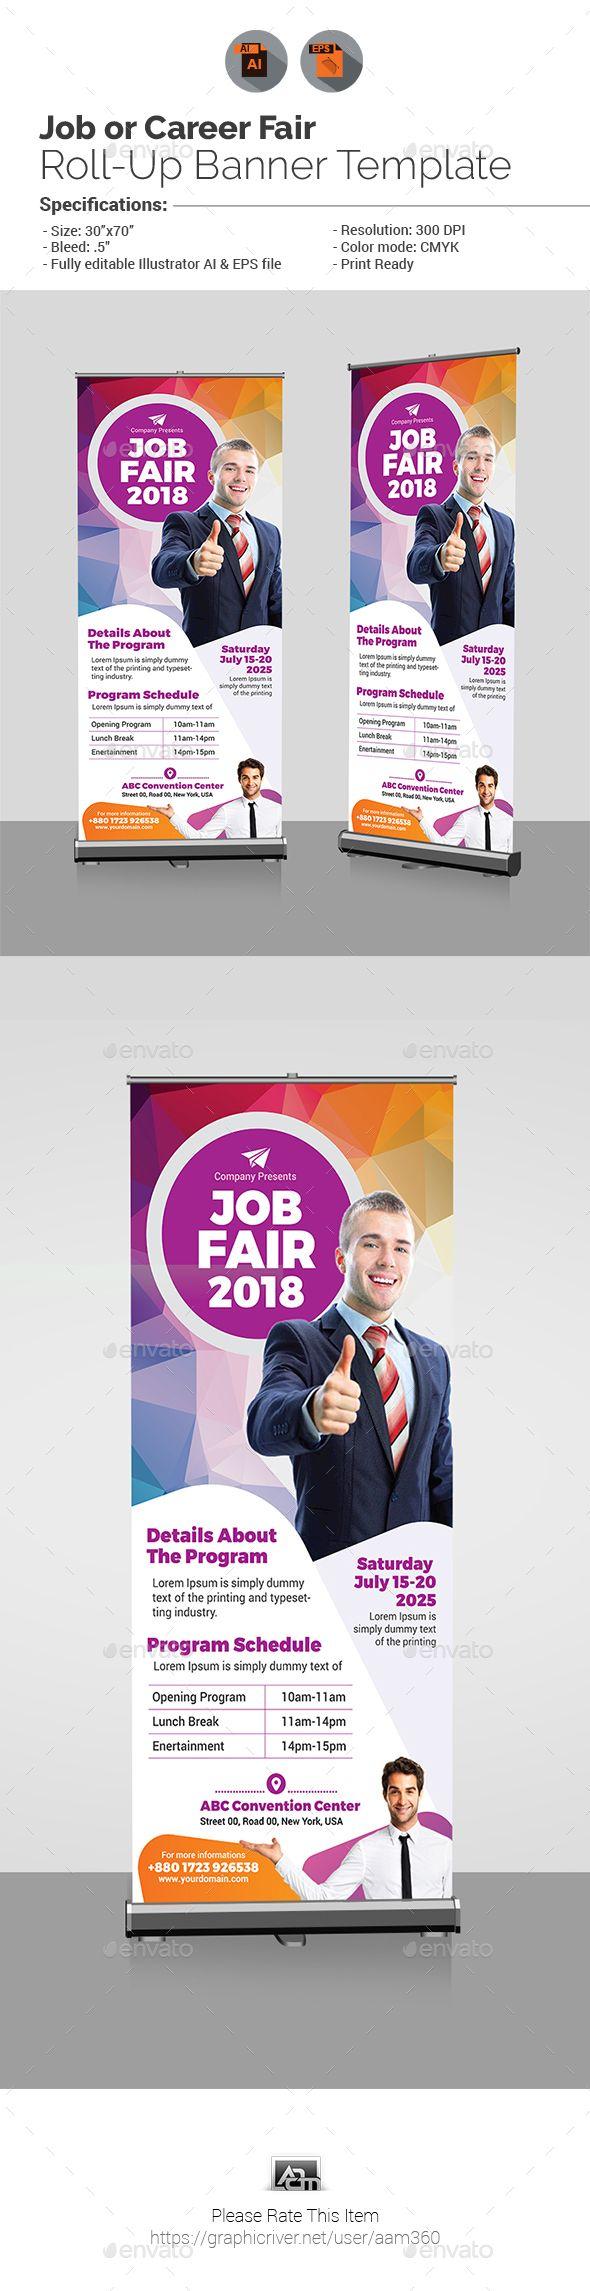 Banner design for job fair - Best 25 Job Fair Ideas On Pinterest Career Fair Tips Pitch And Four Seasons Recruitment